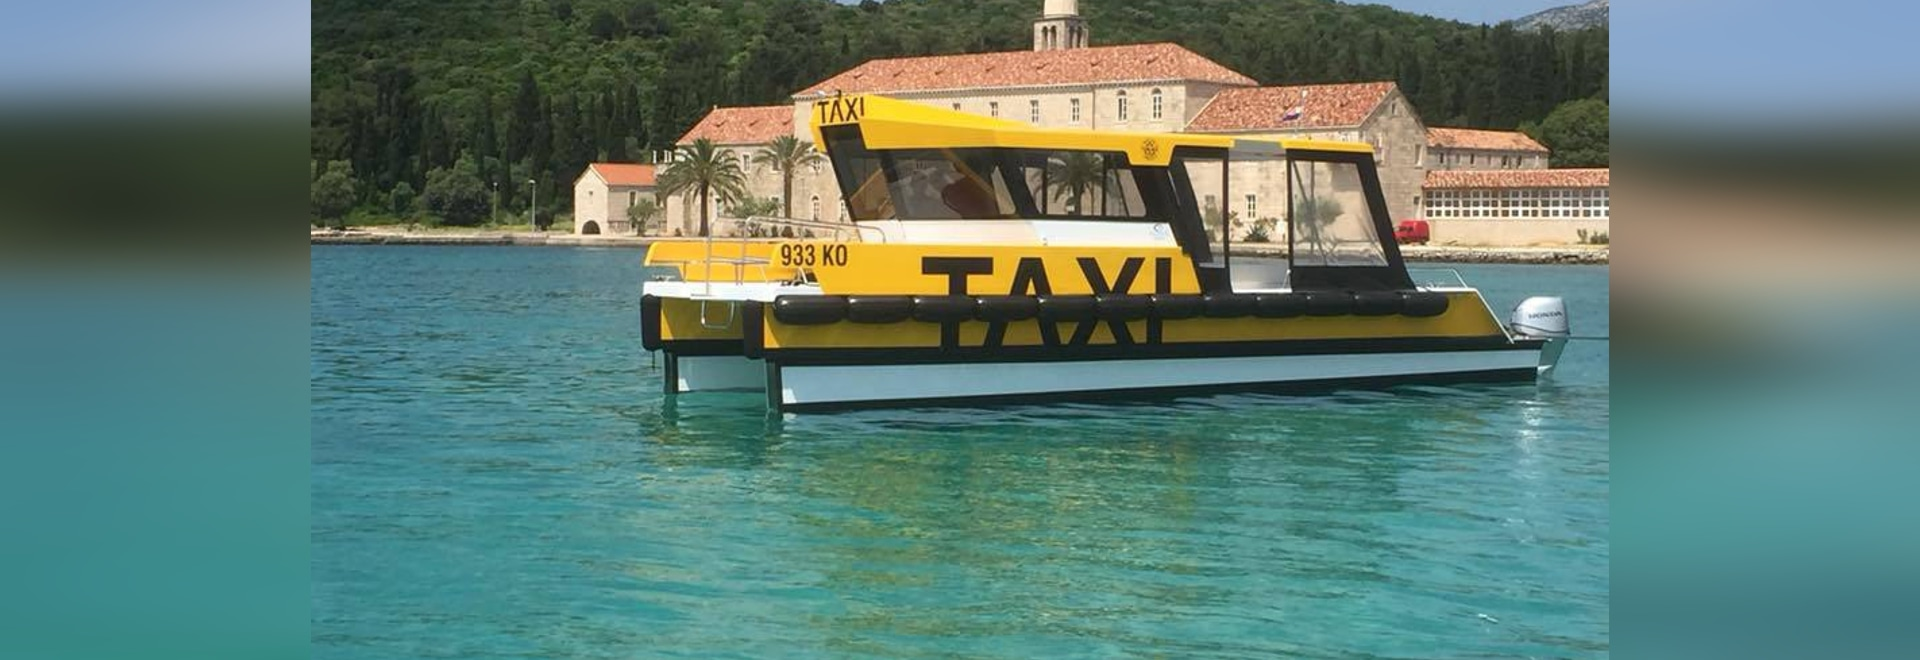 Taxi-Katze